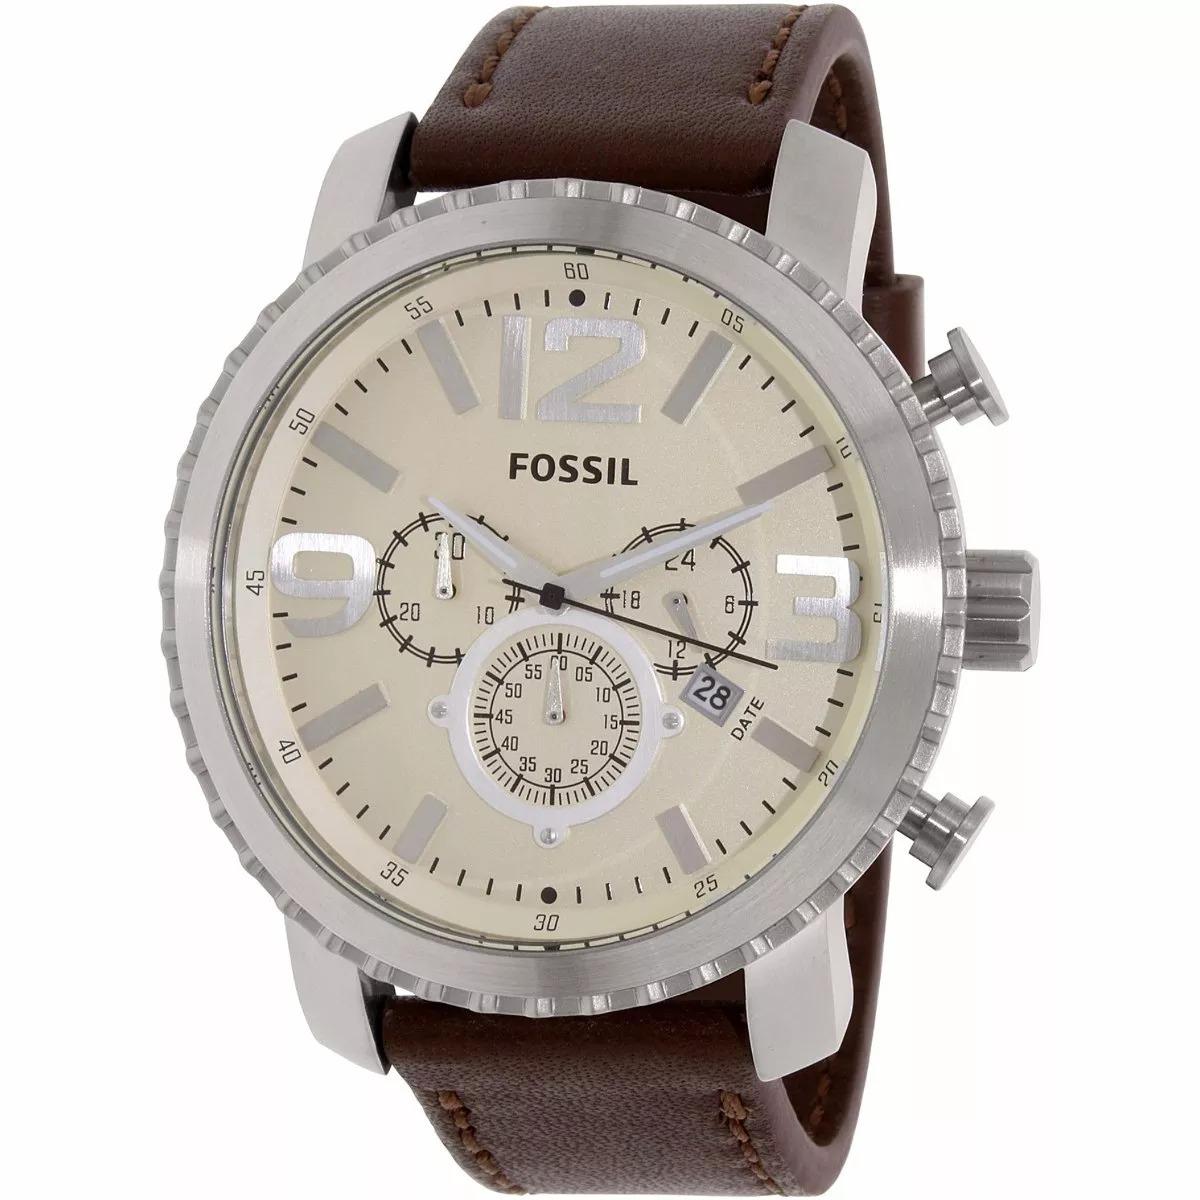 Relógio Fossil Masculino Original Chronograph Bq1177 - R  499,00 em ... f1c70bc8ee